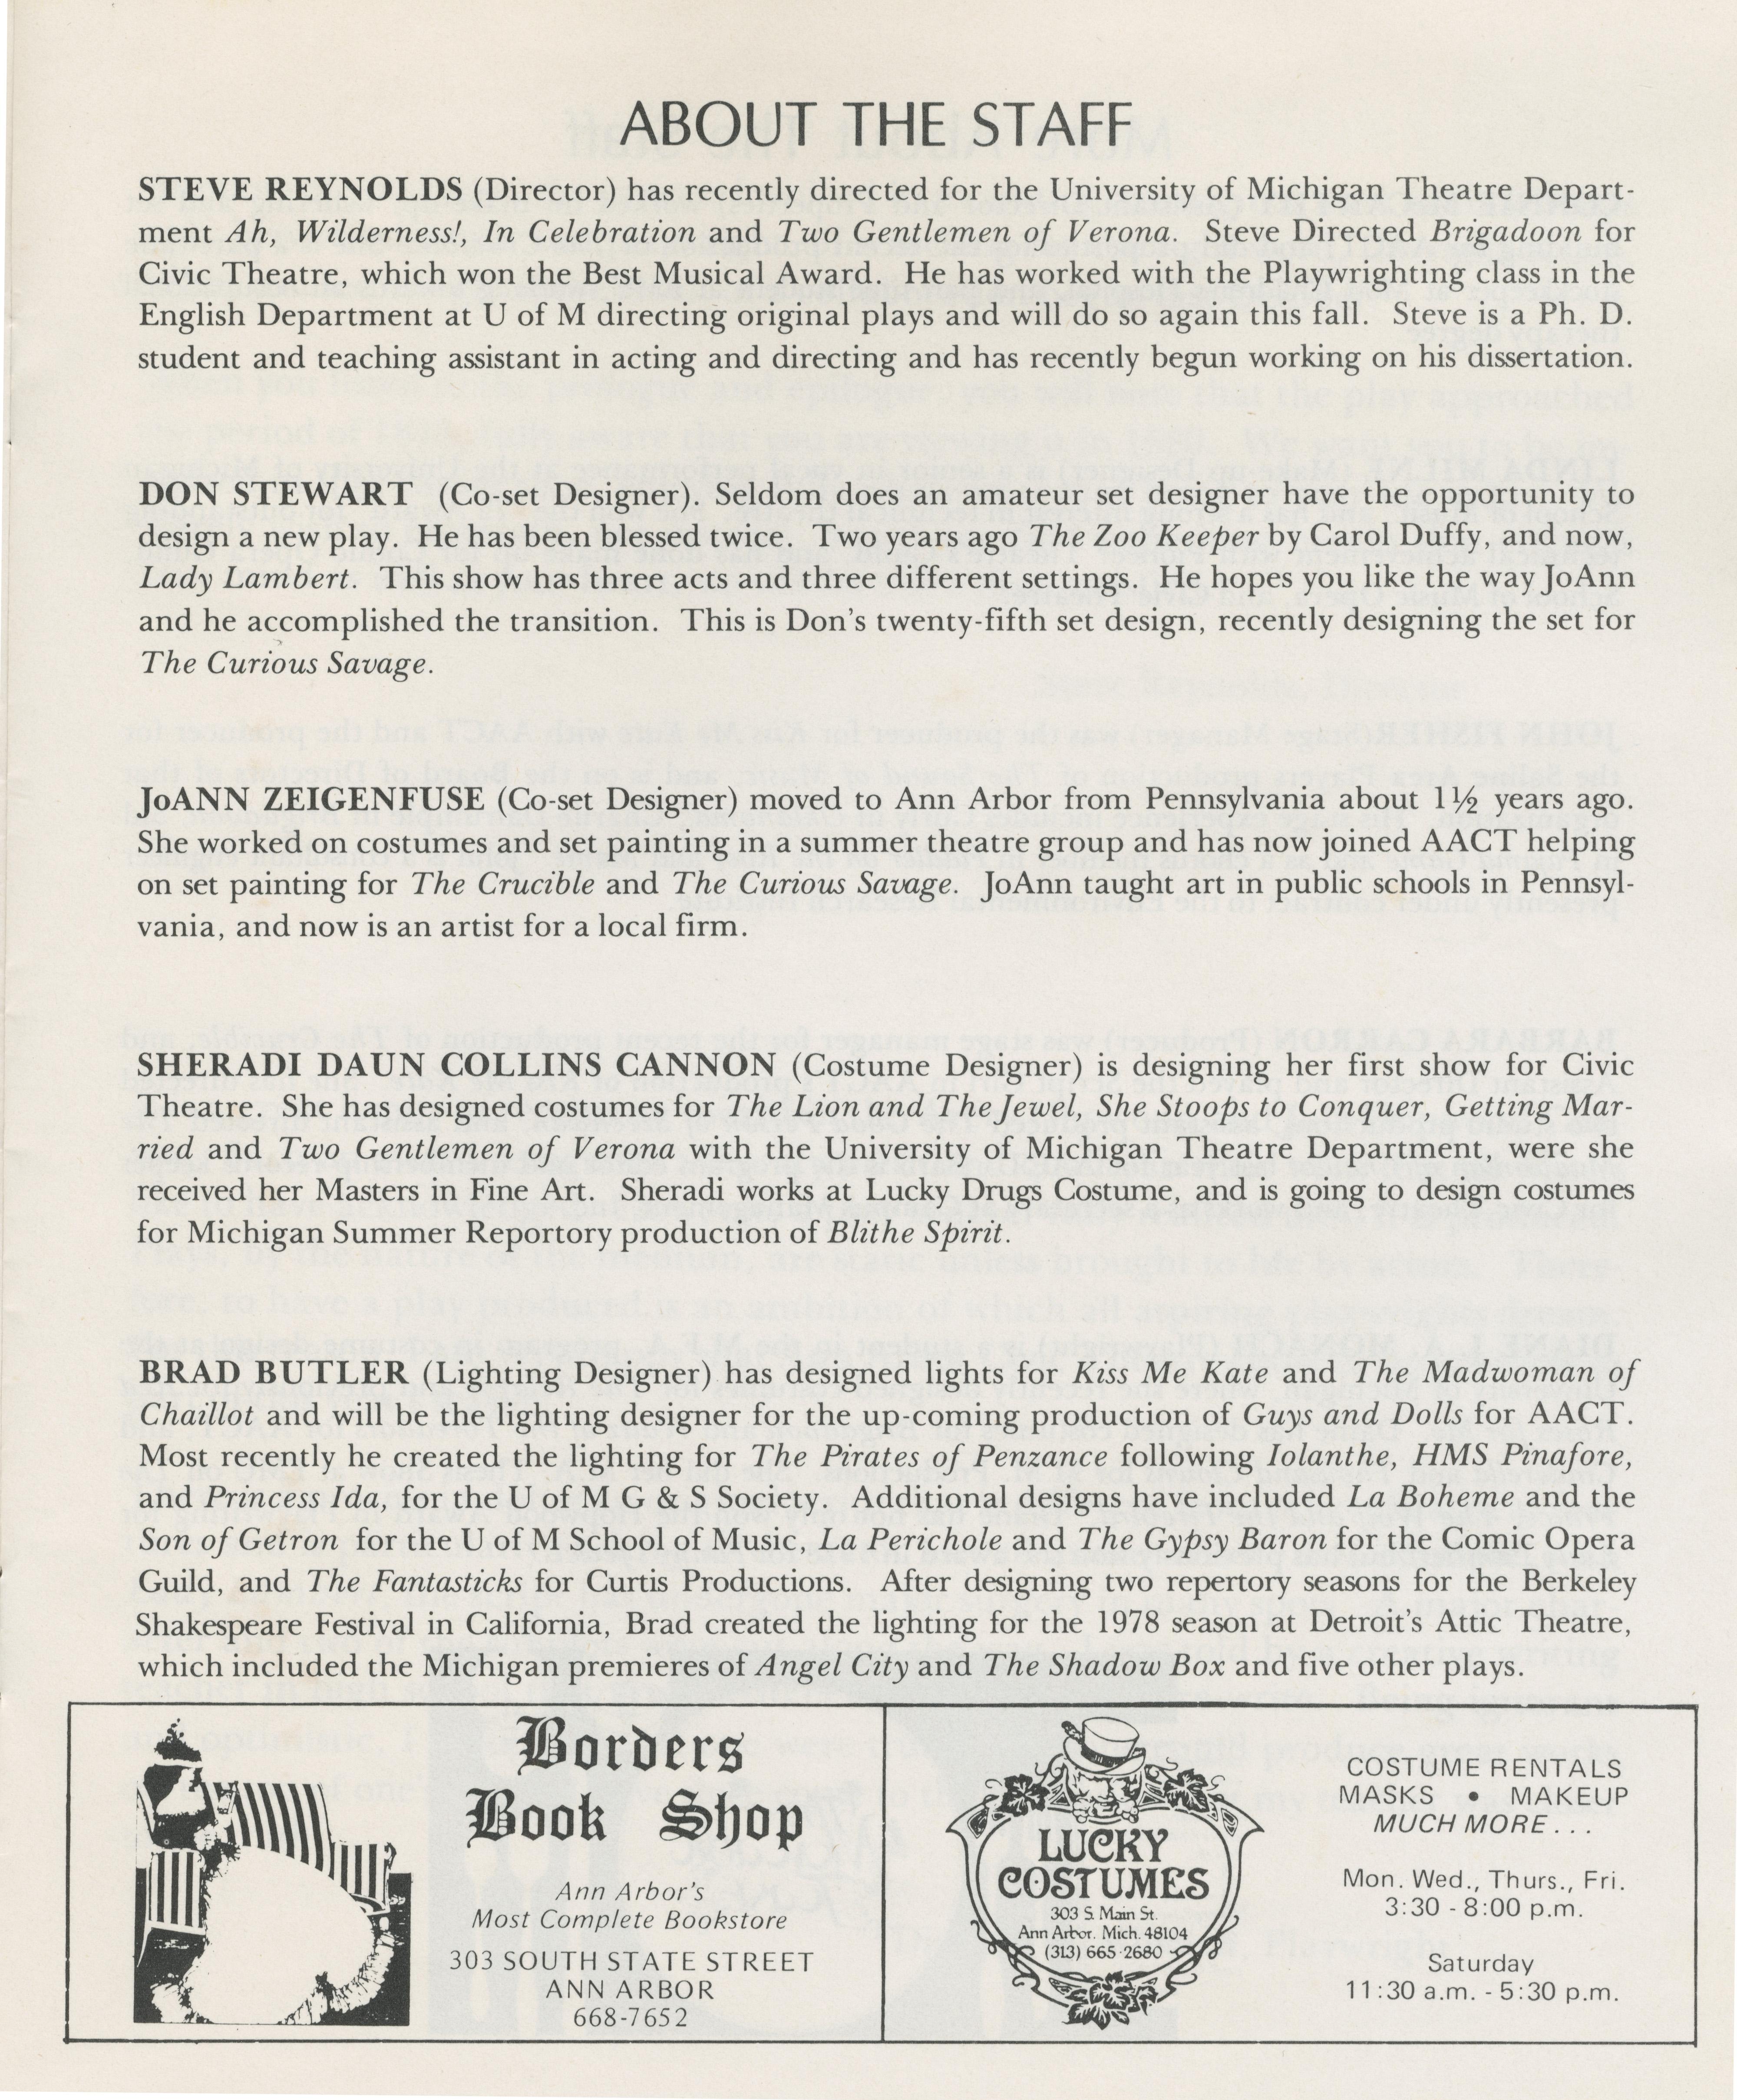 ann arbor civic theatre program lady lambert may 14 1980 ann